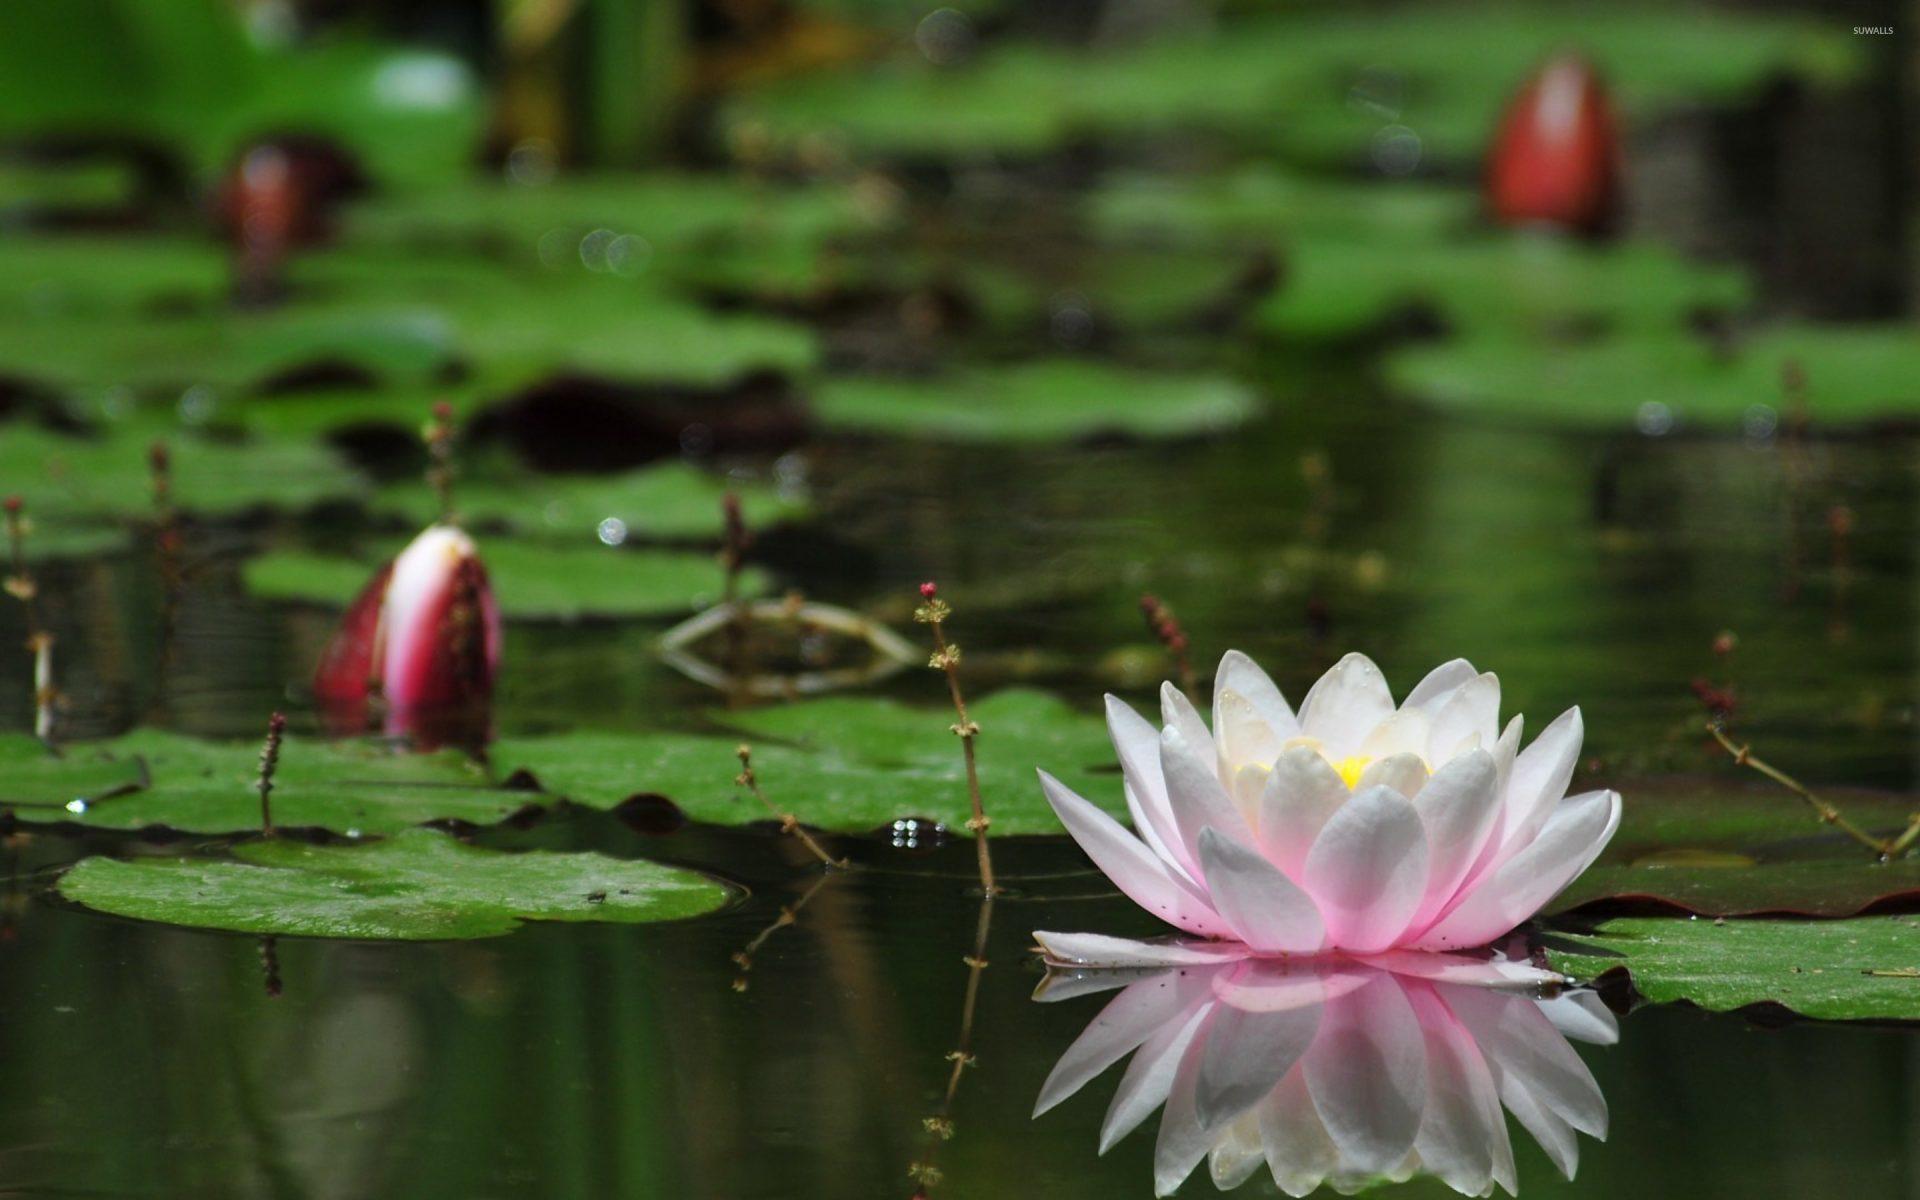 Lotus Flower Water Desktop Wallpaper Backgrounds Free Download.